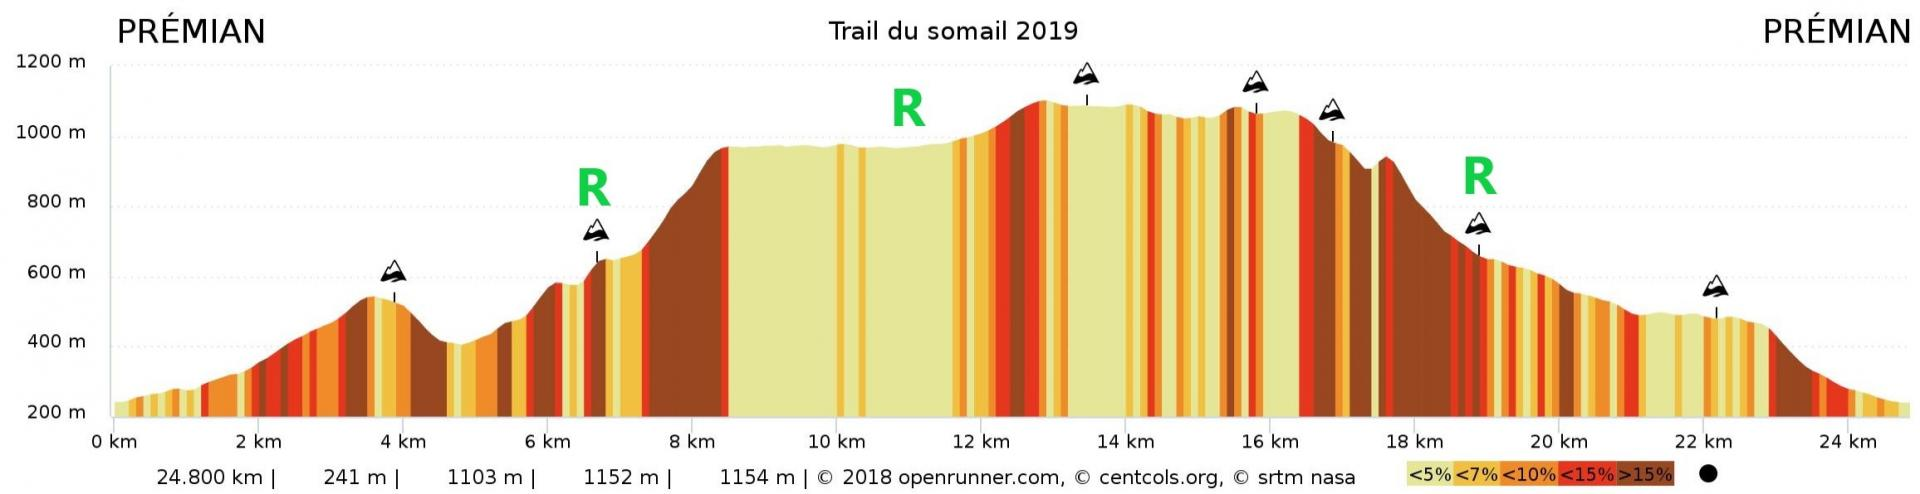 Profil trail du somail 2019